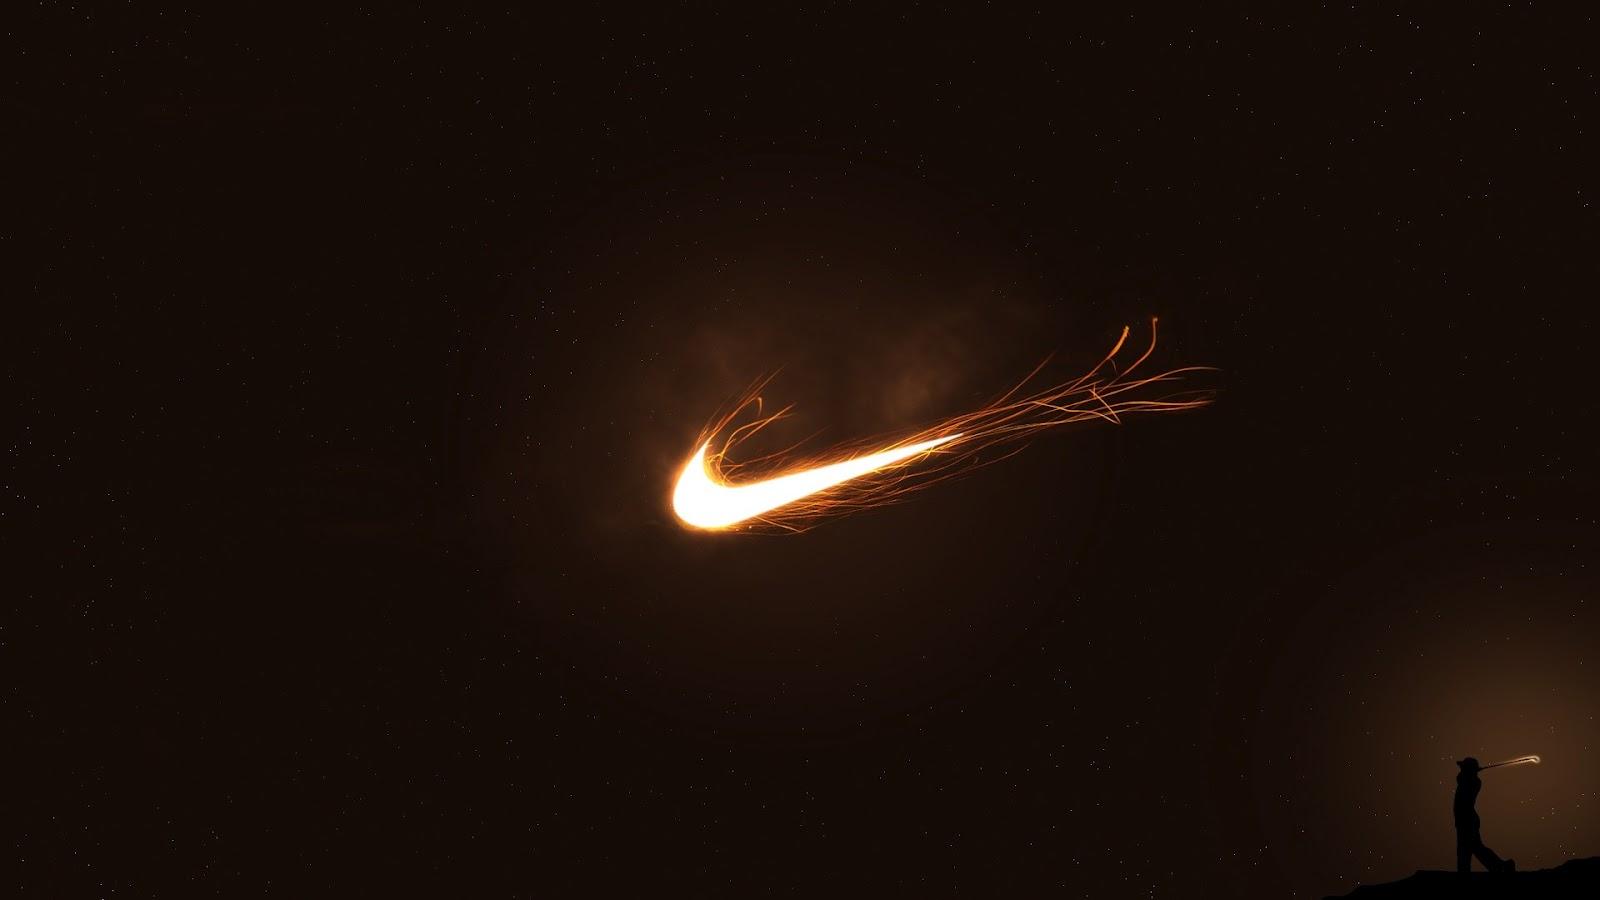 Hd wallpaper nike - Nike Brand Logo Minimal Hd Wallpapers Download Free Wallpapers In Hd